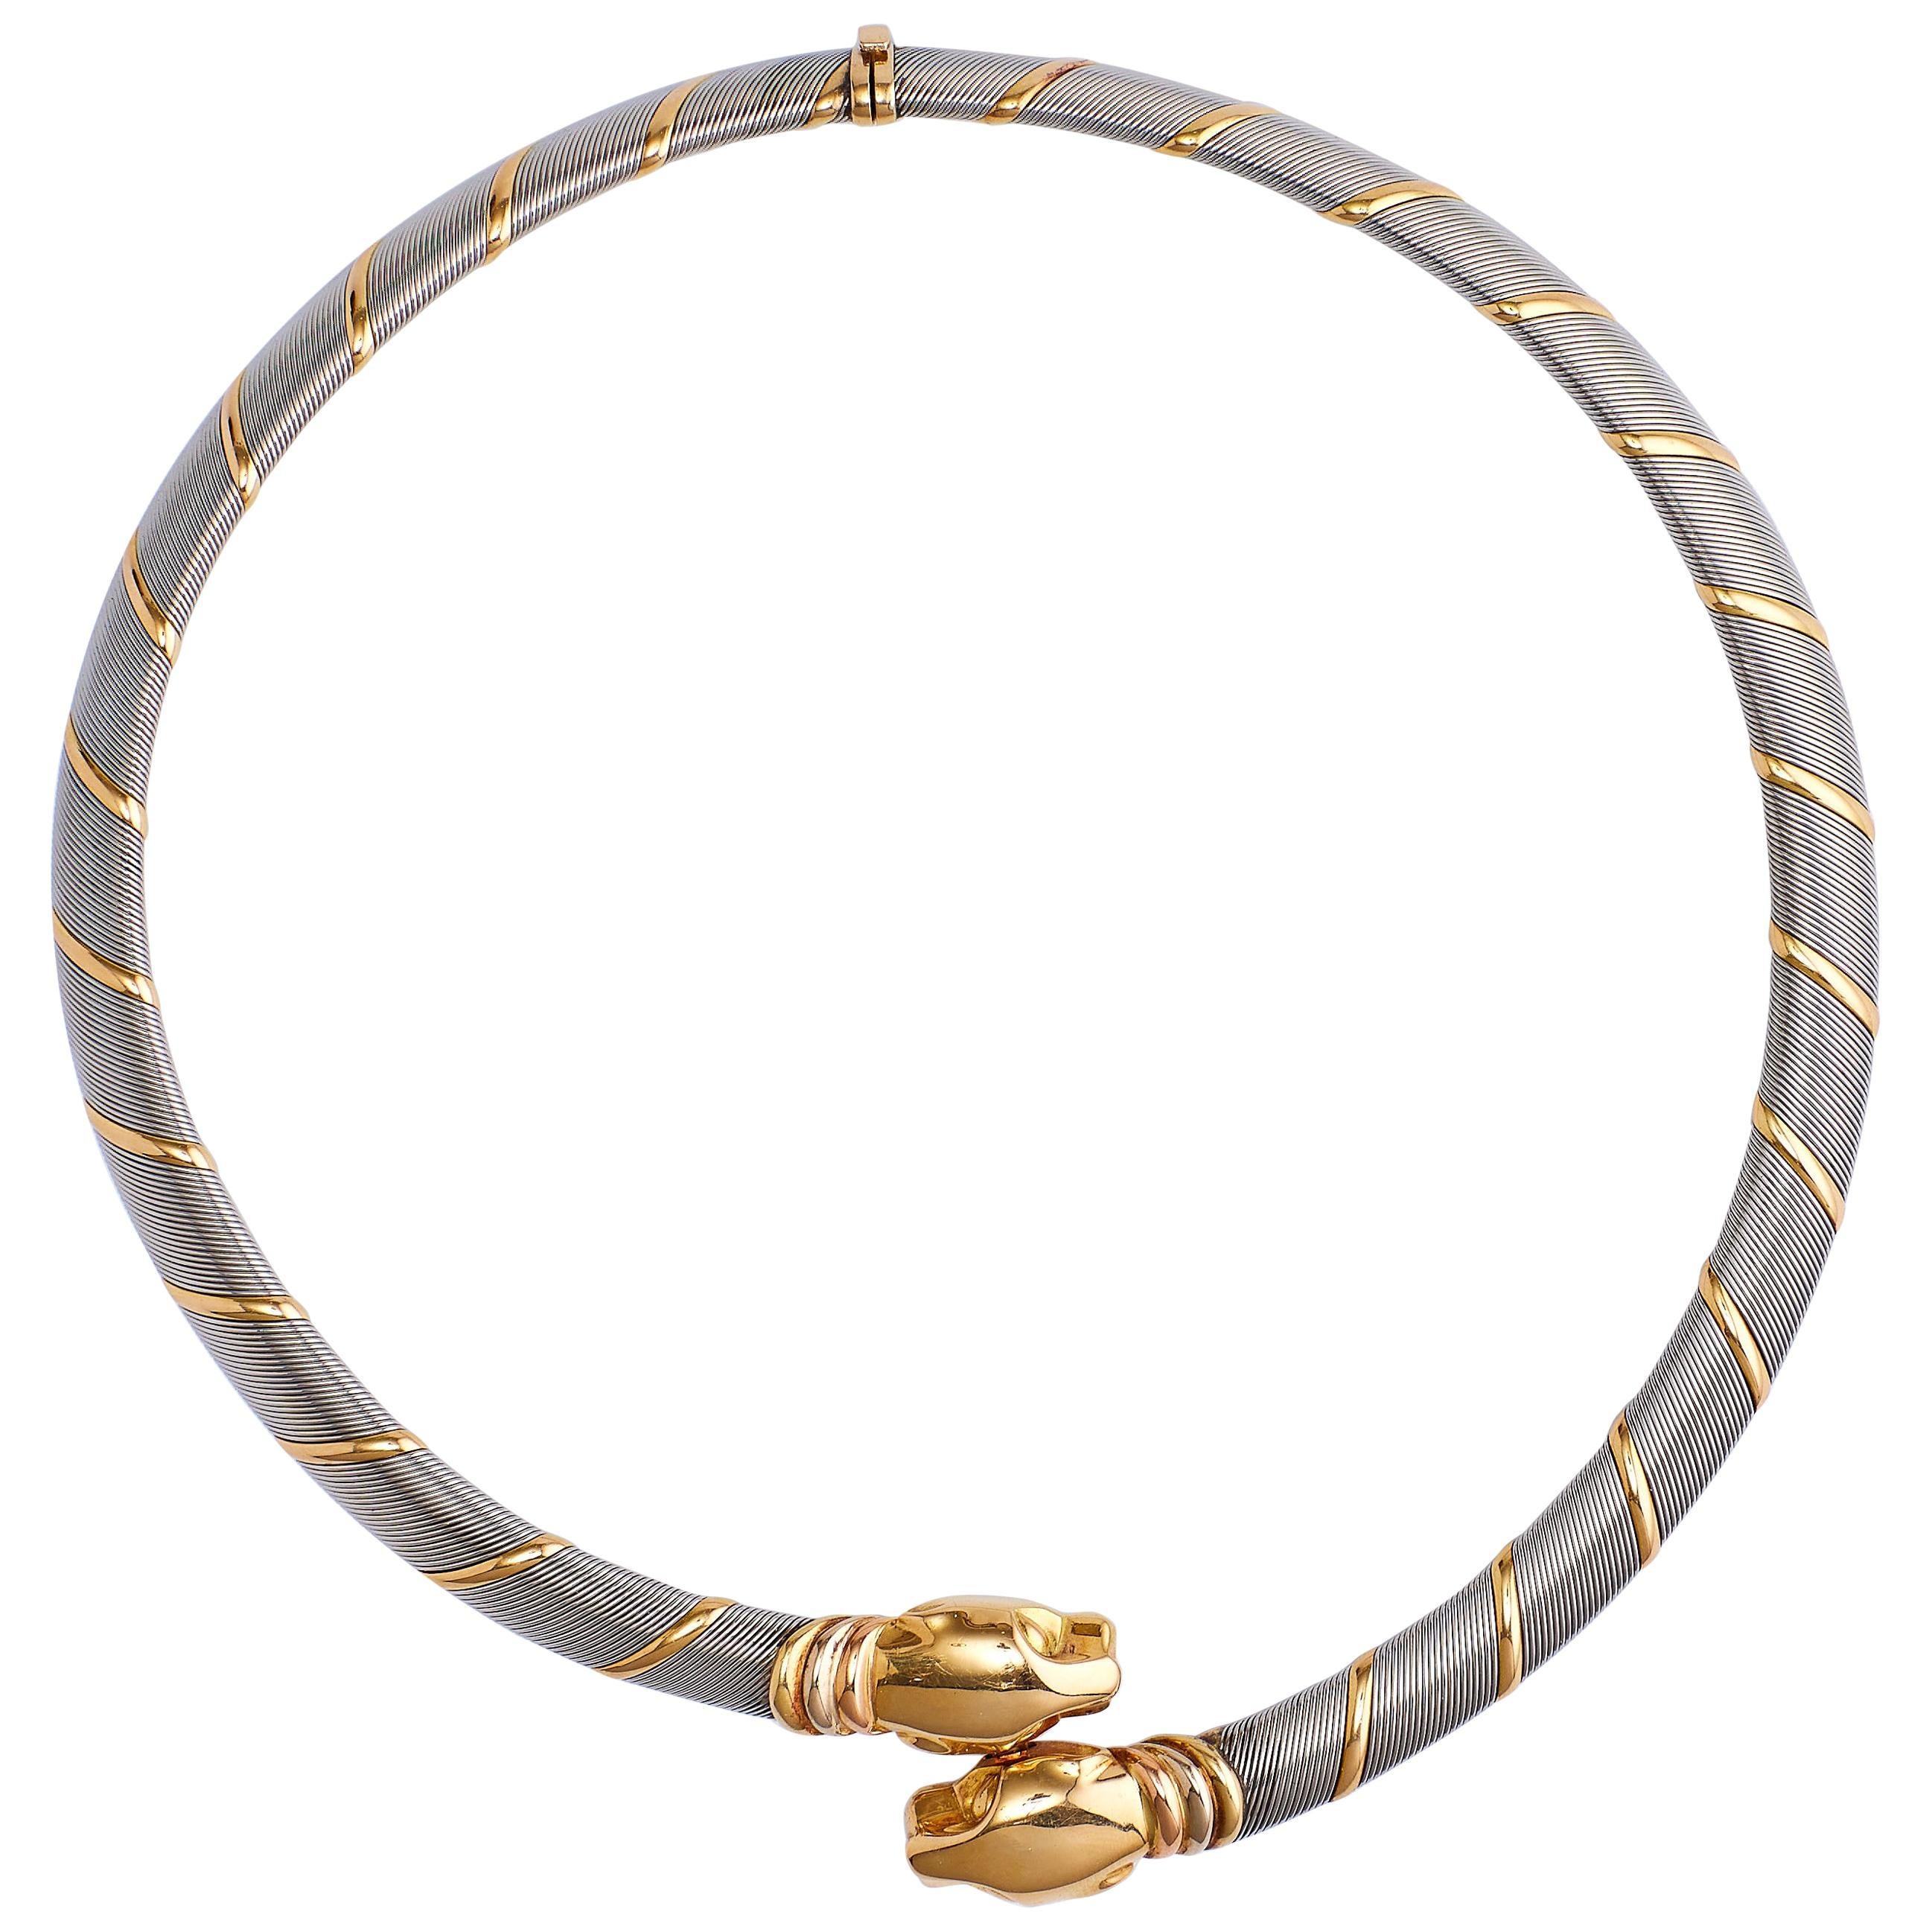 Cartier Choker 'Collar' 18 Karat Gold Double Headed Panther Necklace